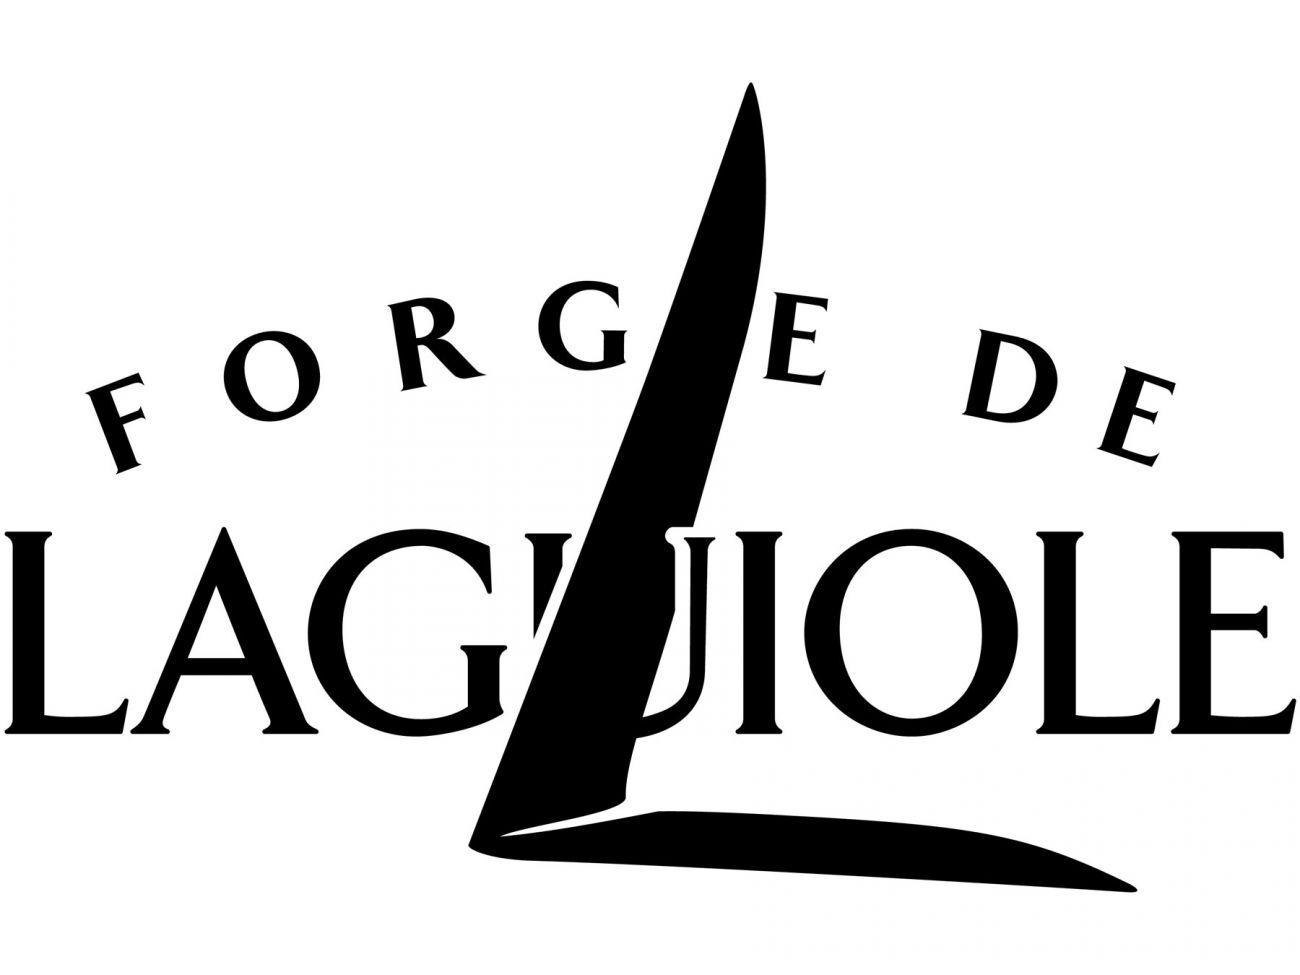 Forge de Laguiole Messer Taschenmesser 11 cm 1011F Pistazie 1011F cm PI glänzend b33a43